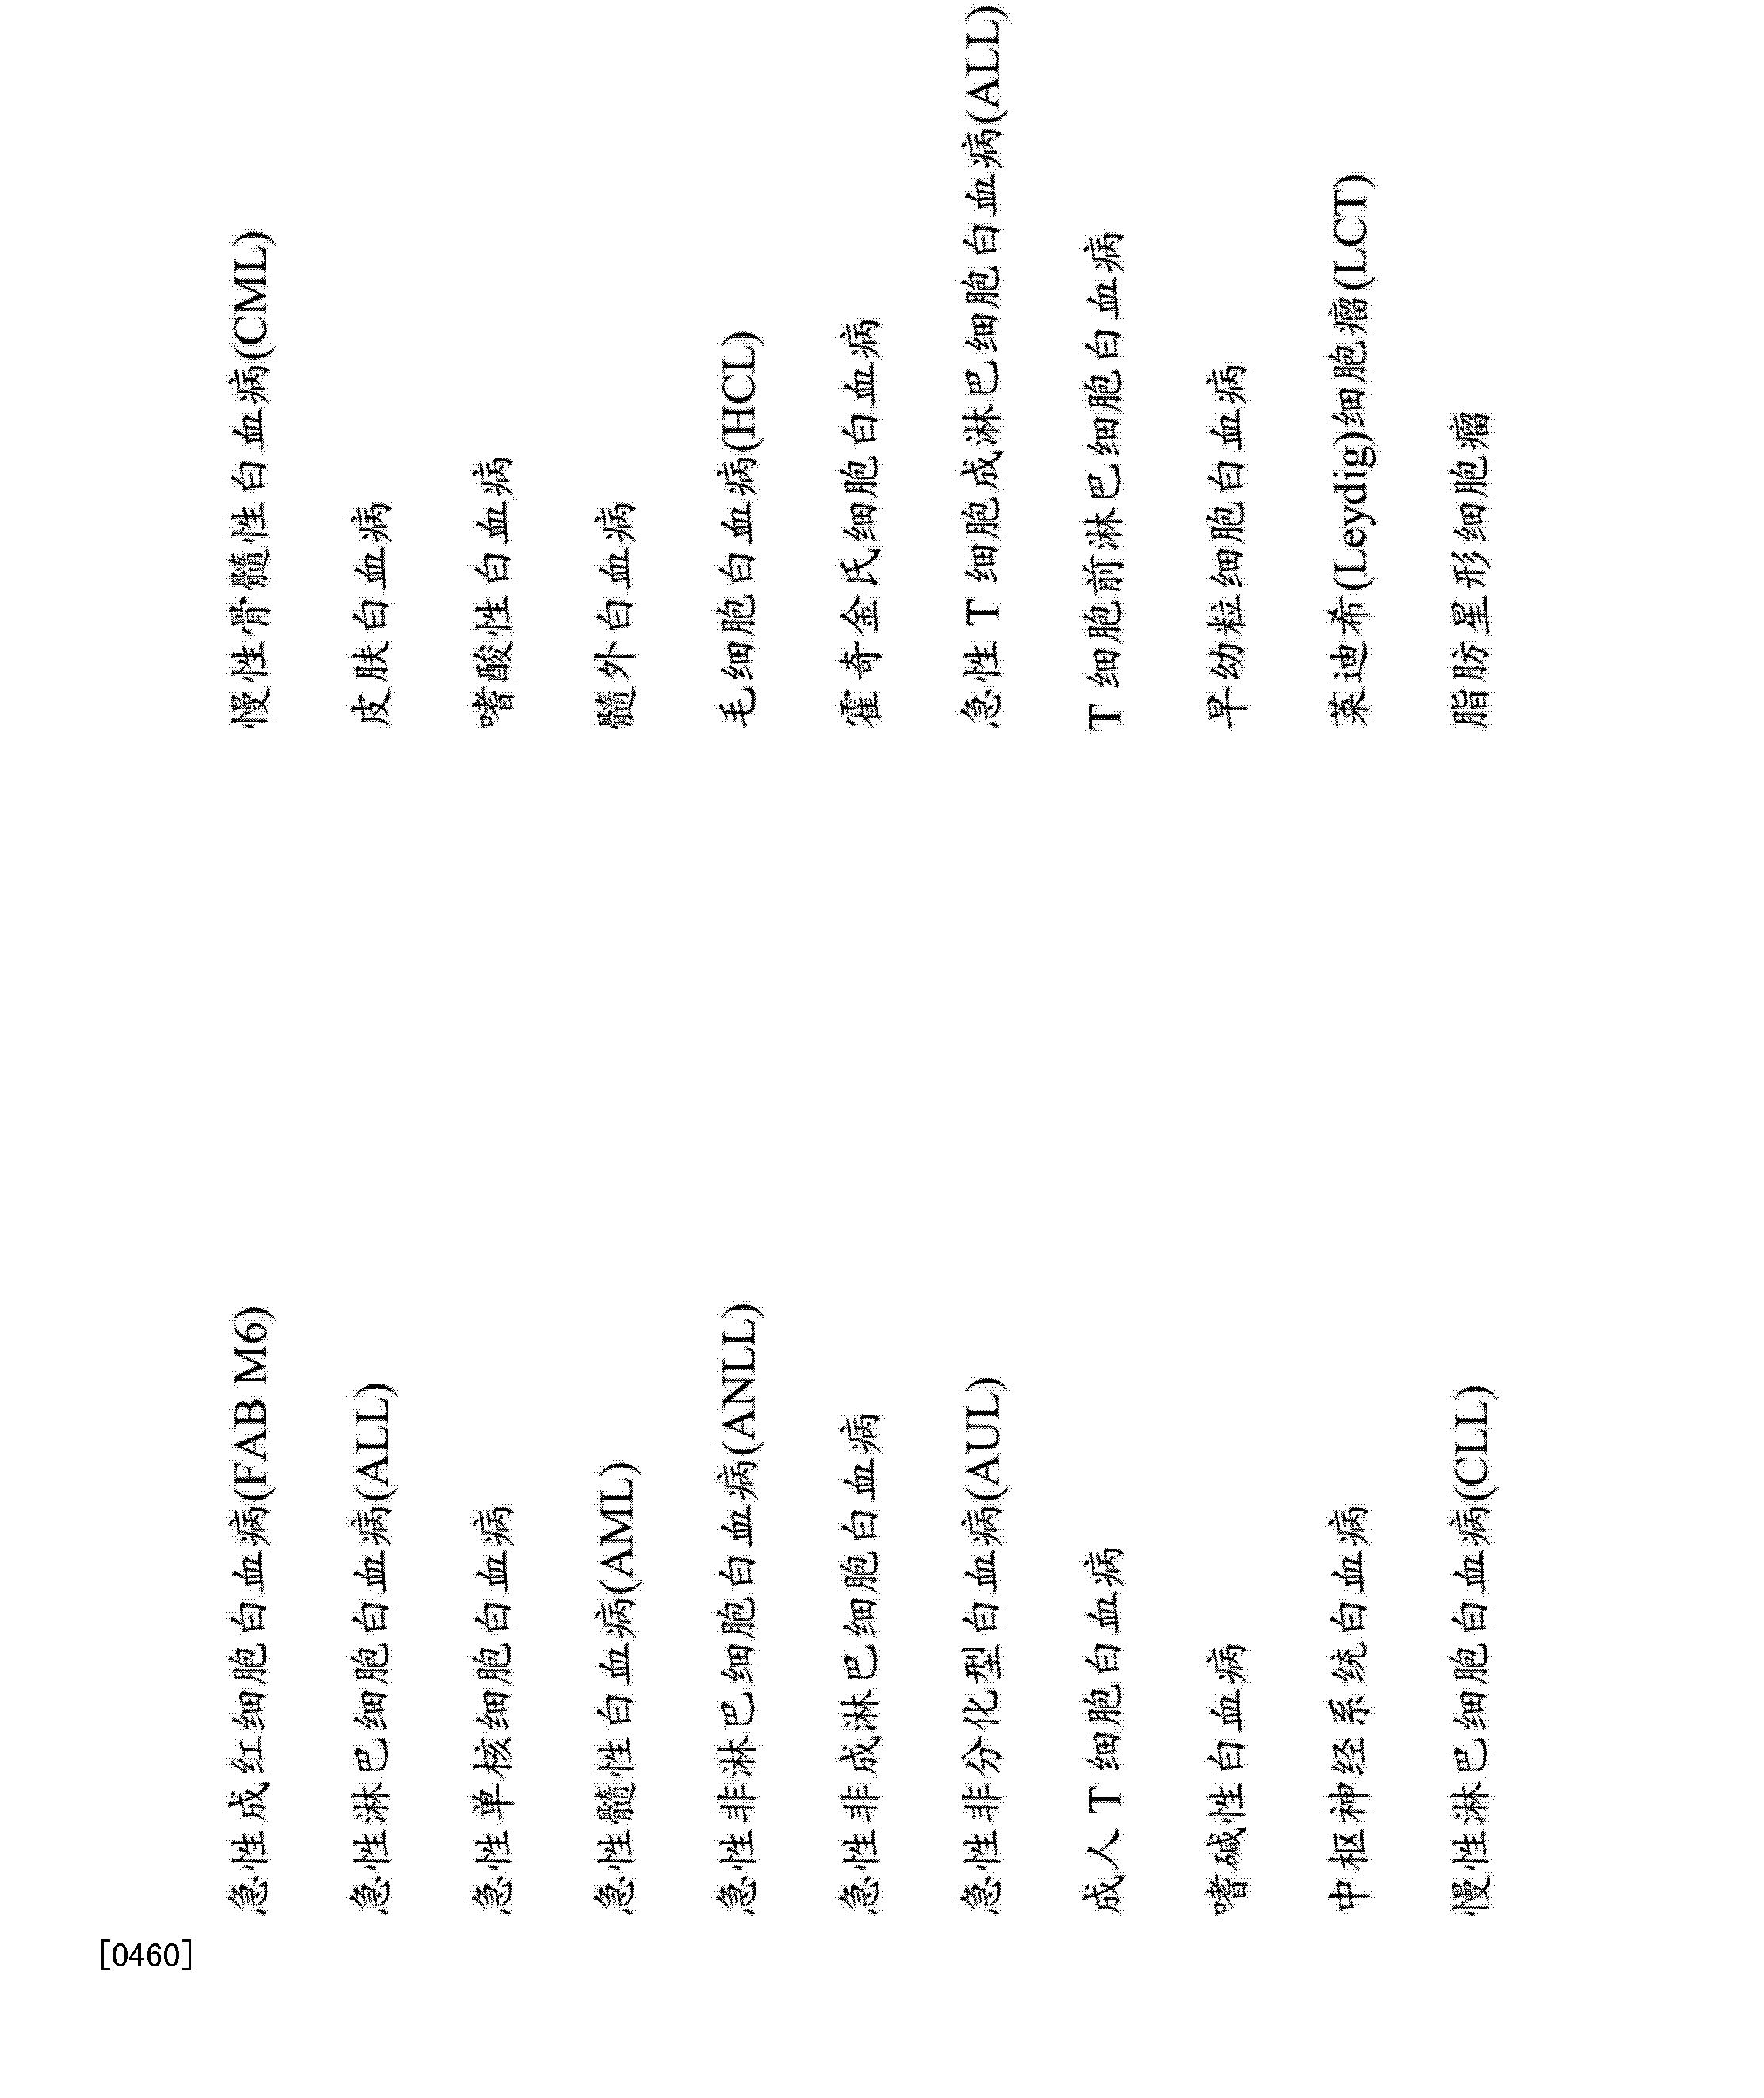 Figure CN103857387AD00731